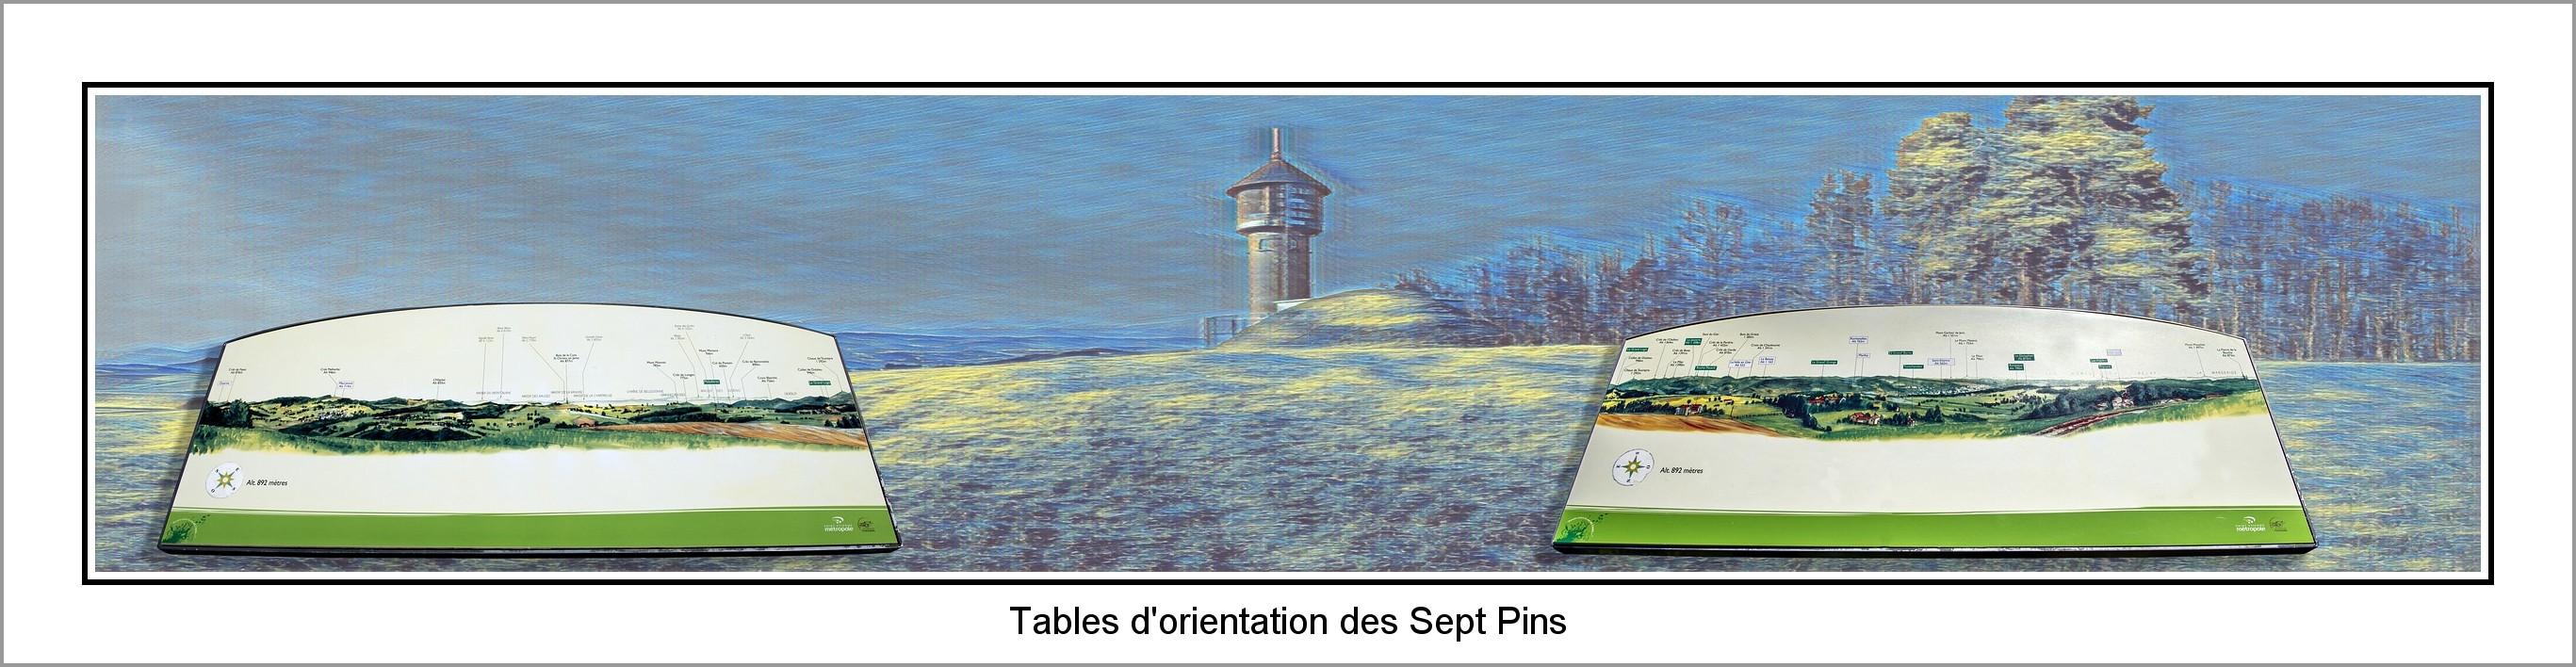 Table d_orientation des sept pins-nano-BorderMaker.jpg